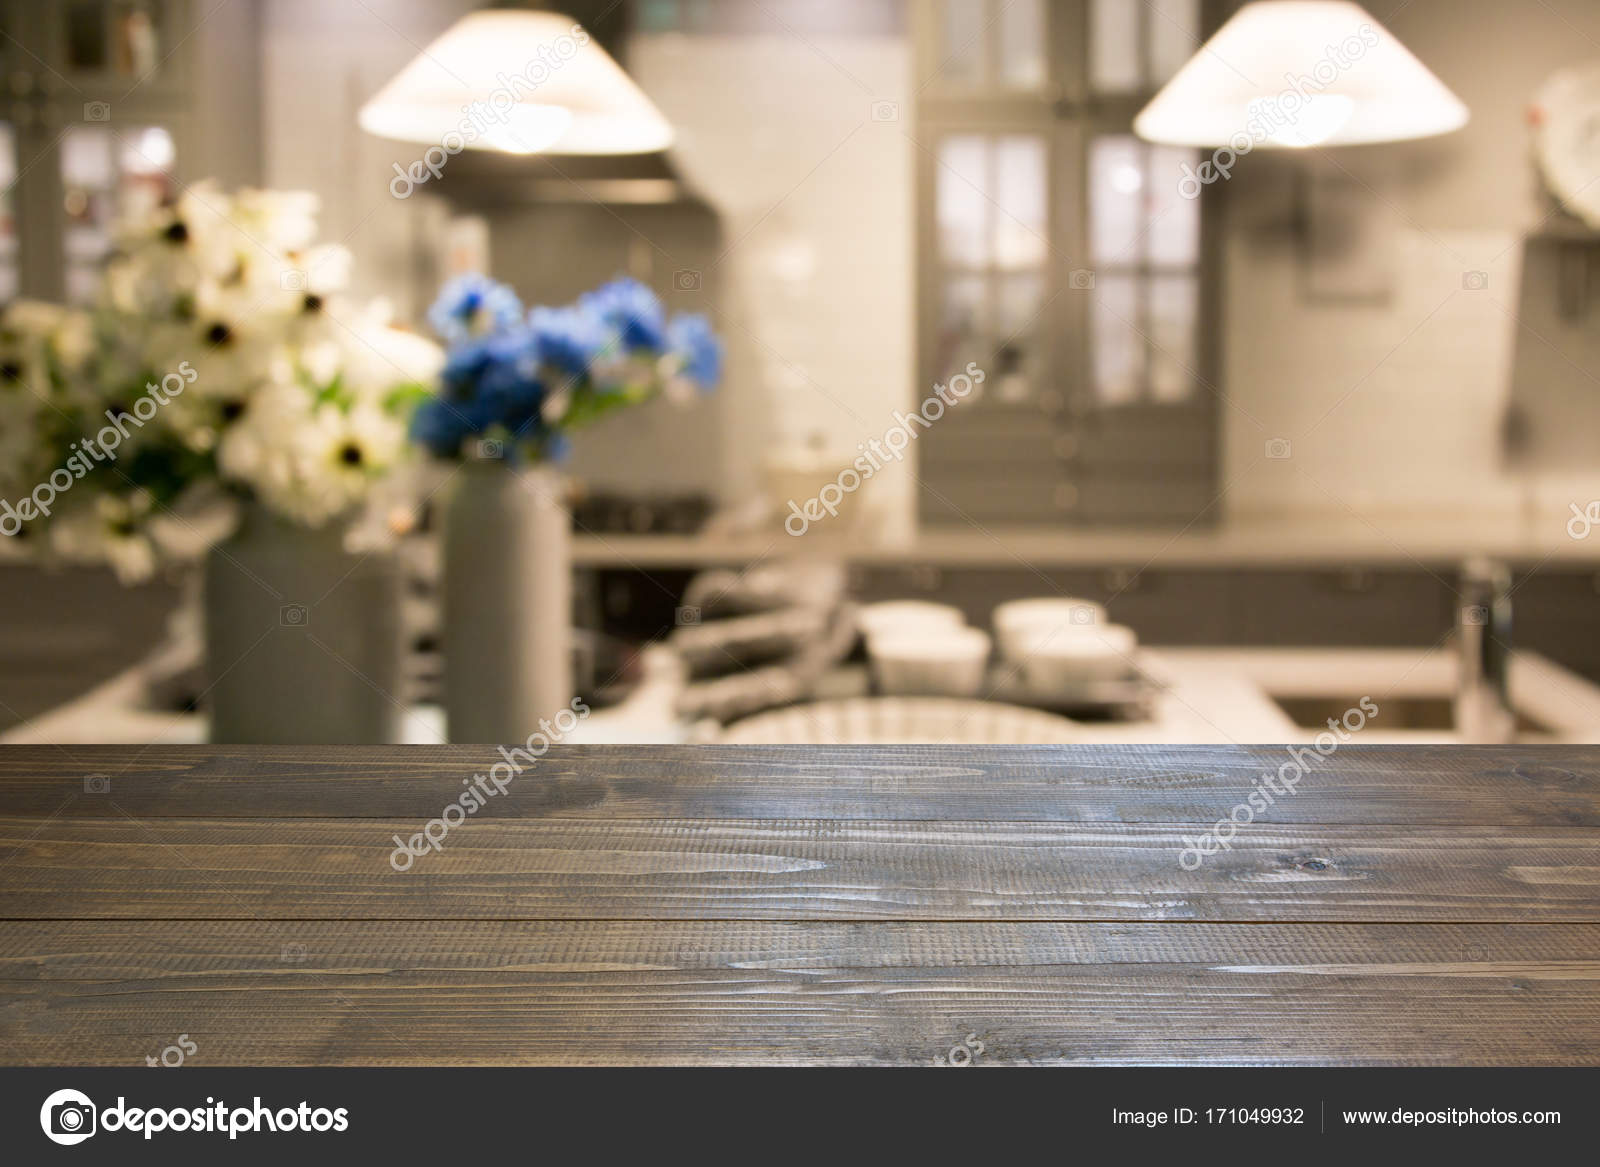 Какие цветы у вас на кухне